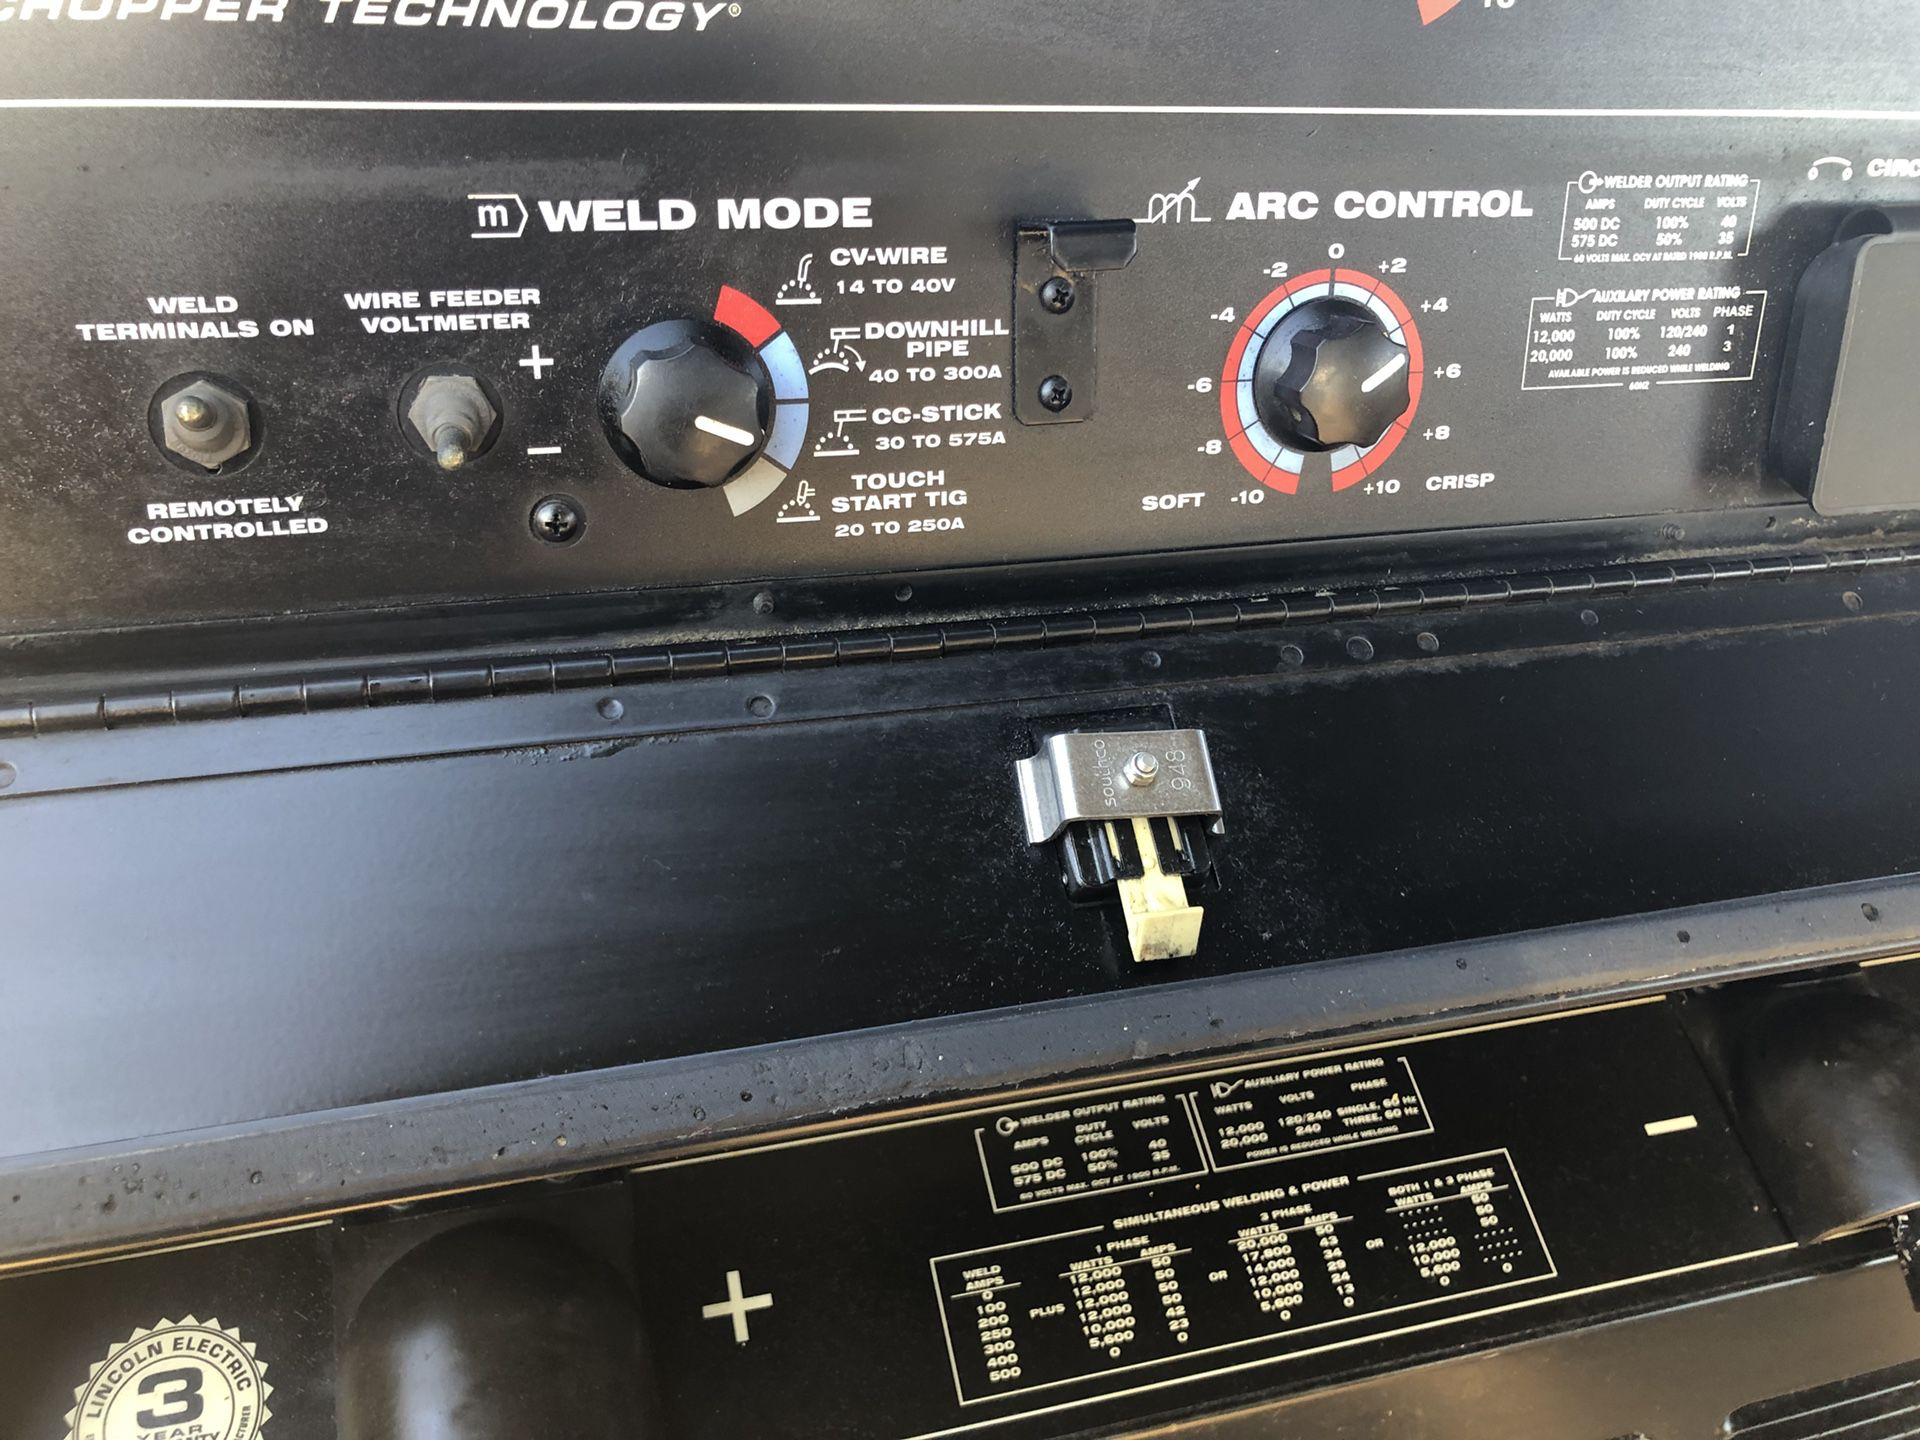 2013 Lincoln vantage 500 diesel 575A welder only 1494 hours